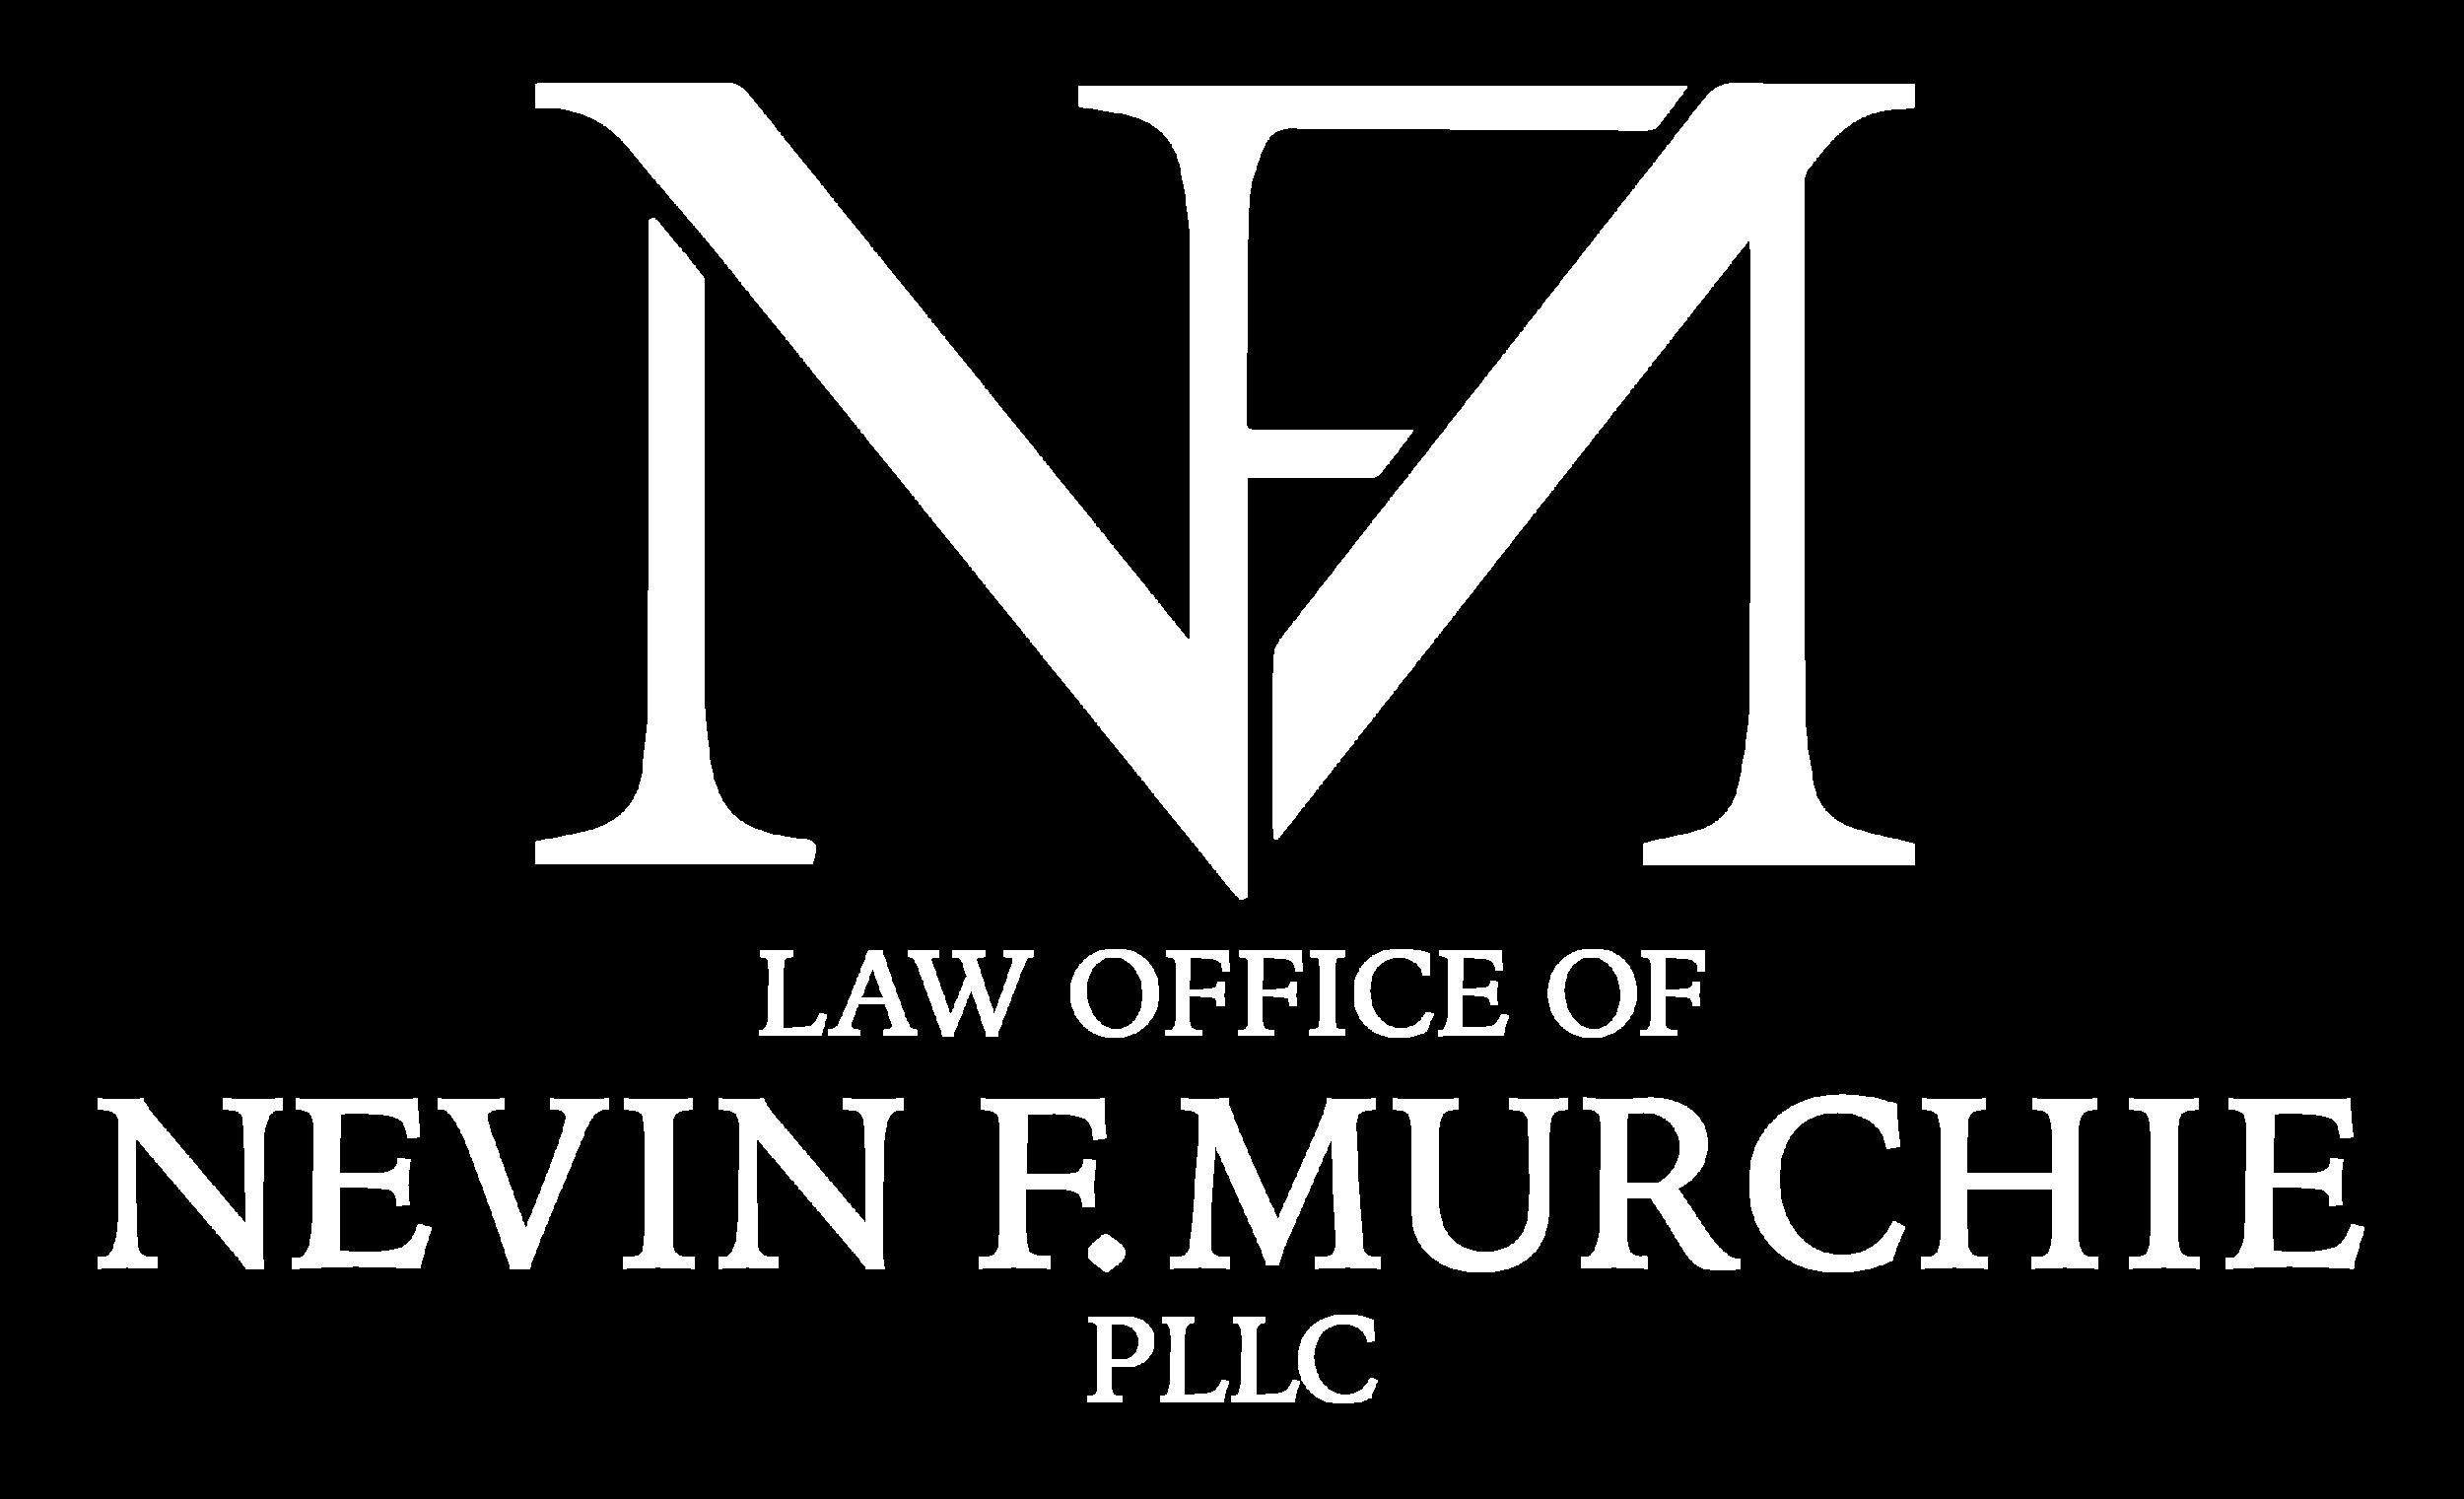 NFMLaw_logo_white-01.png